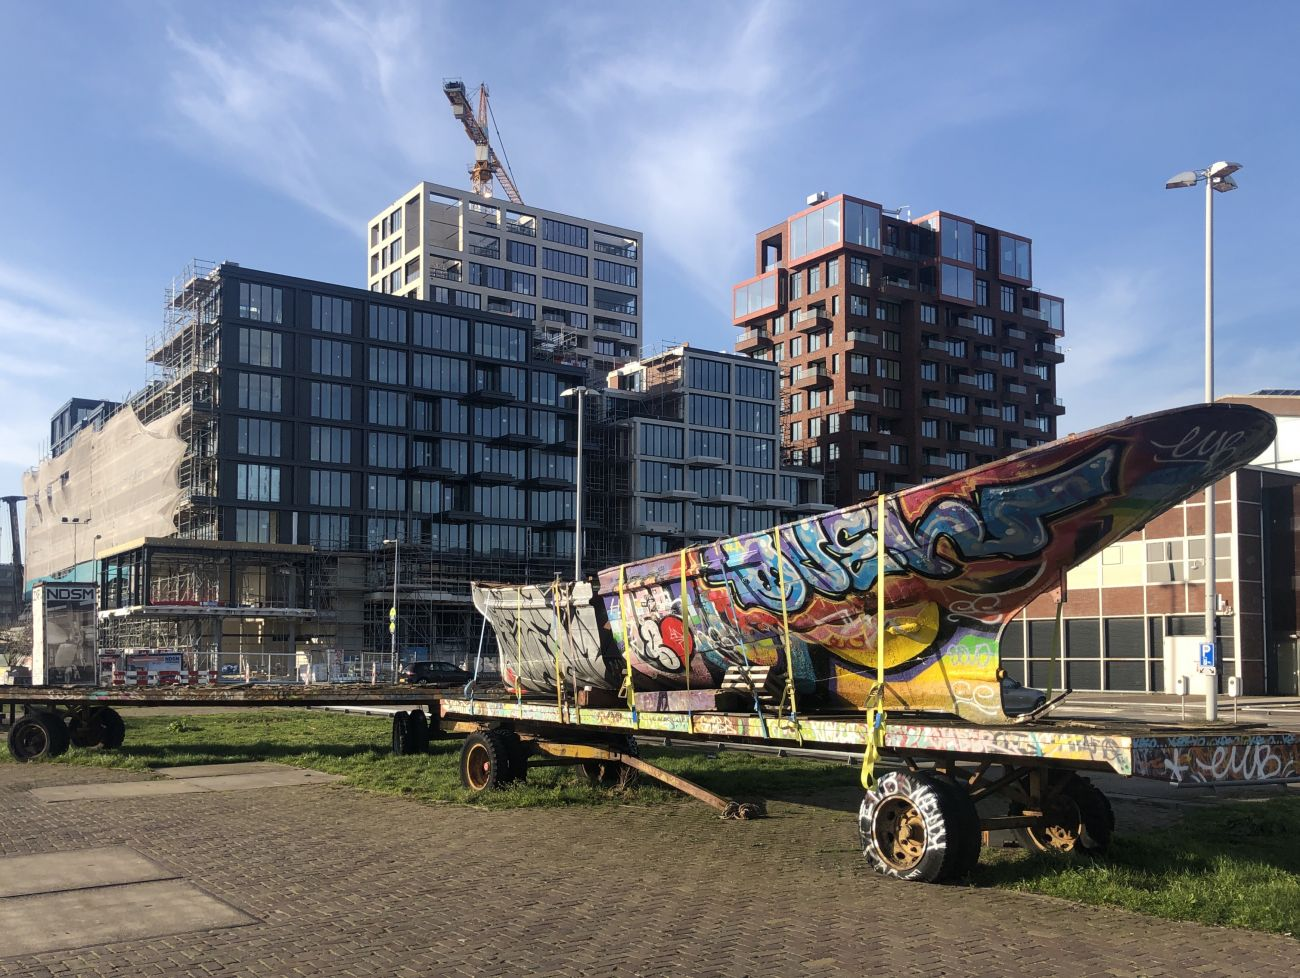 Foto Pontkade Amsterdam boot